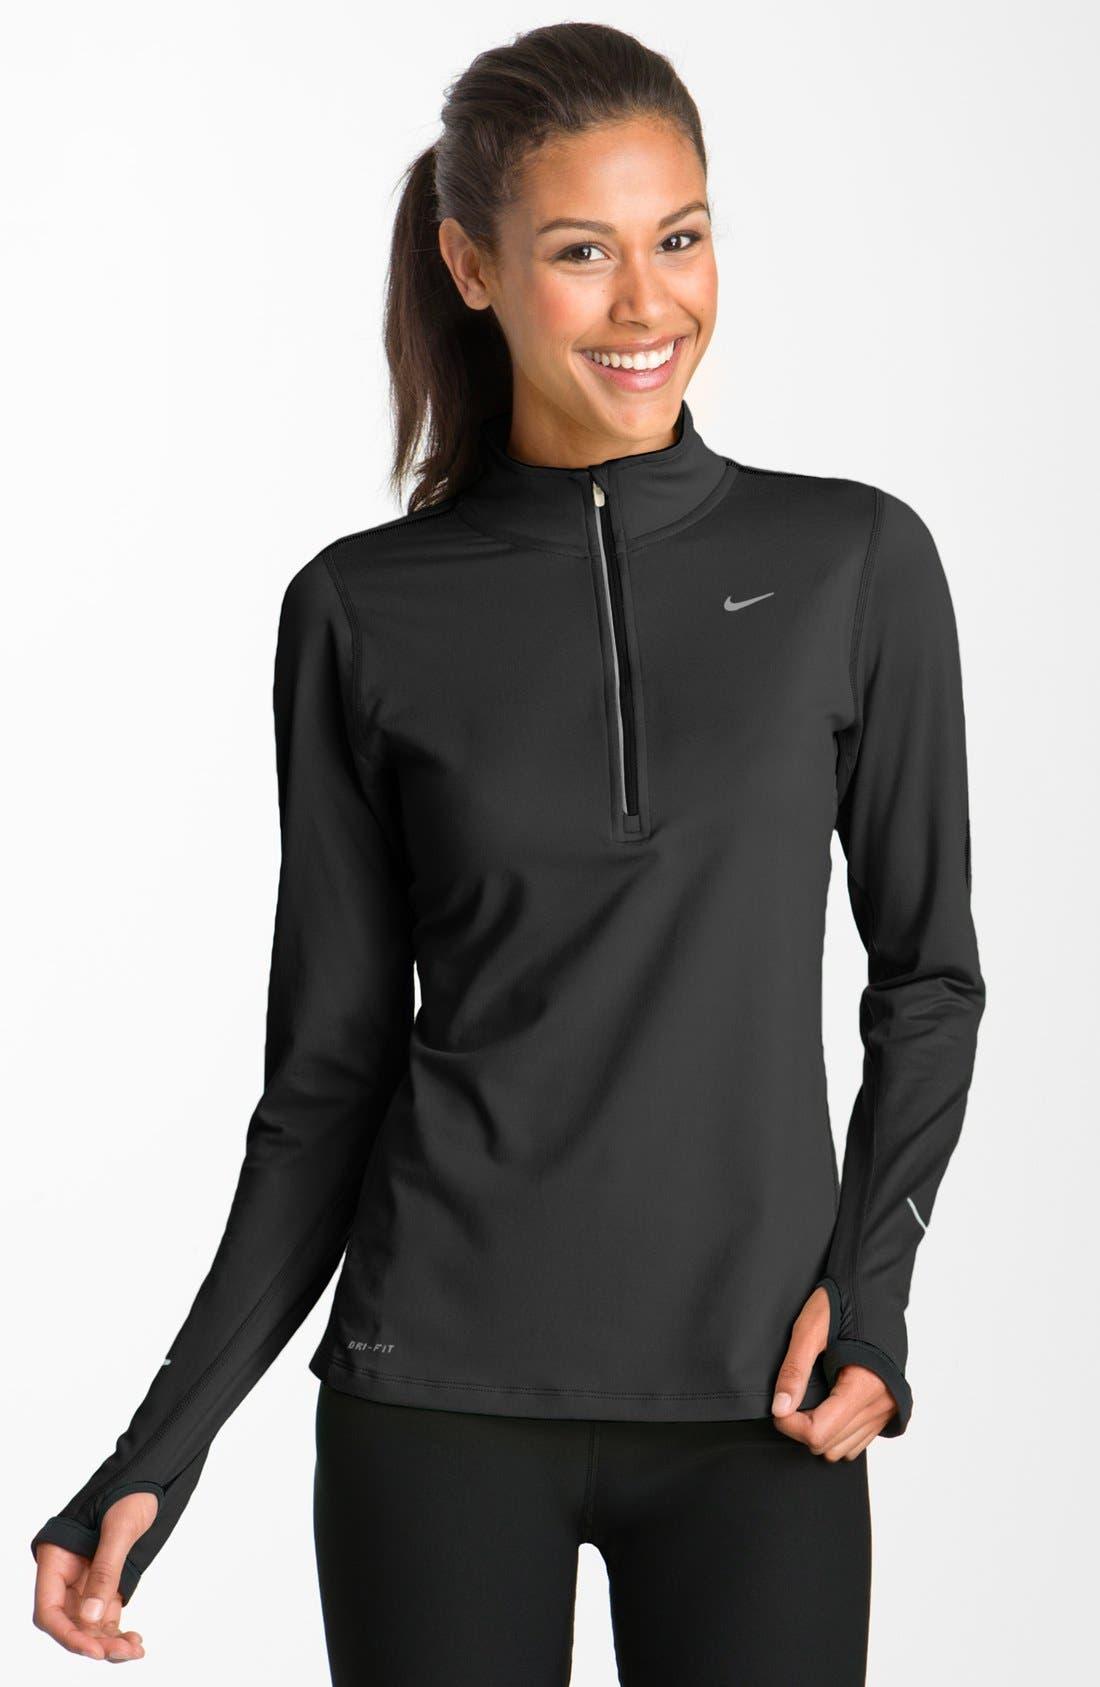 Alternate Image 1 Selected - Nike 'Element' Dri-FIT Half Zip Performance Top